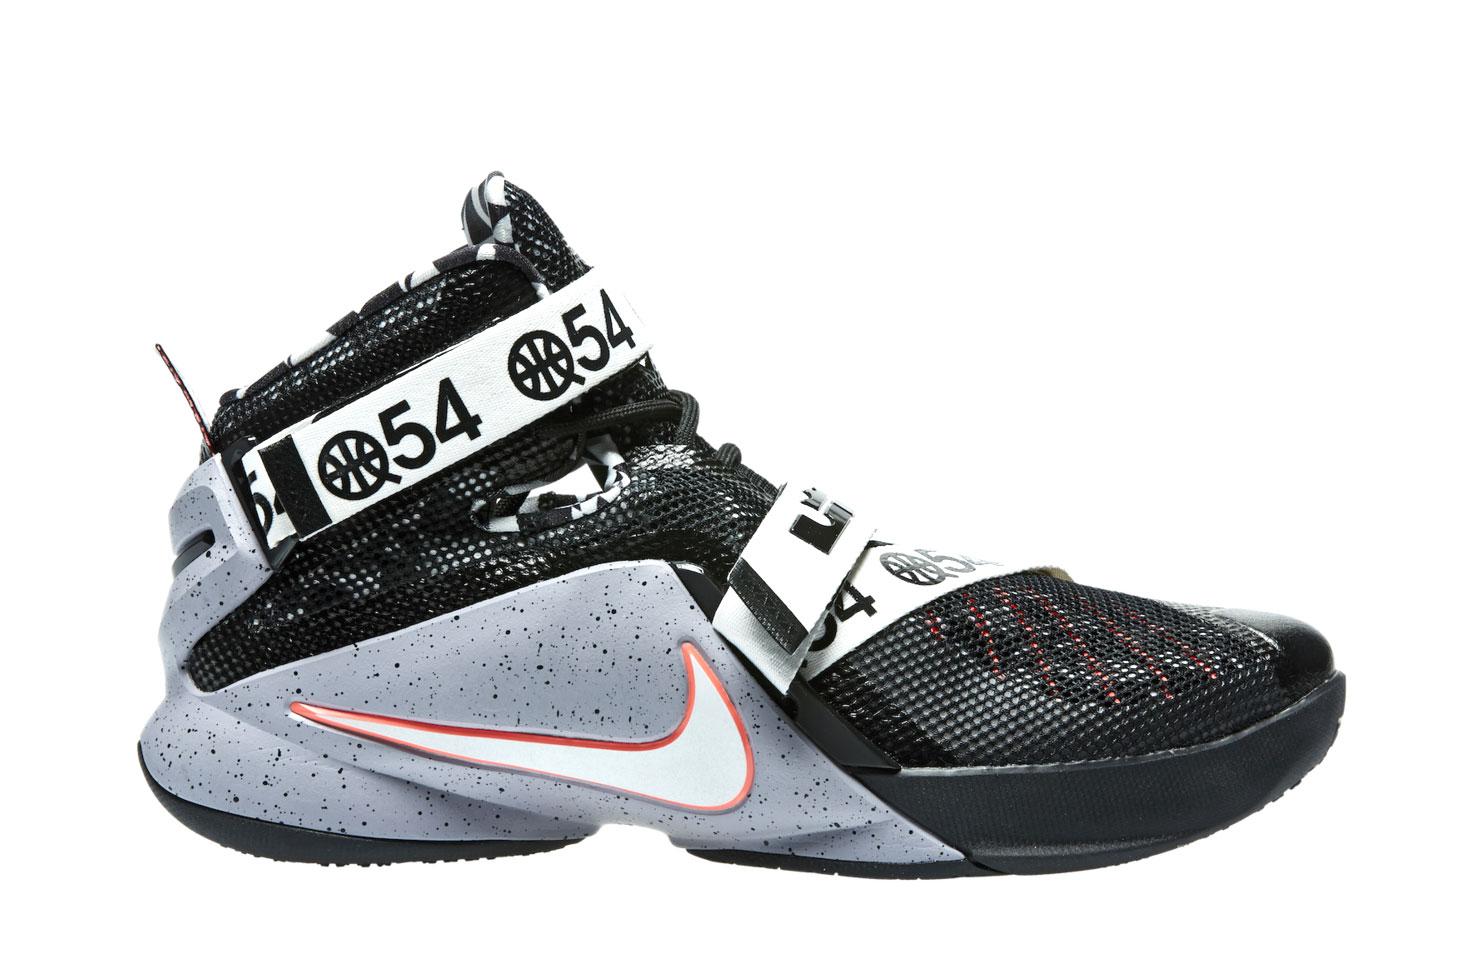 Quai 54 x Nike LeBron Soldier 9